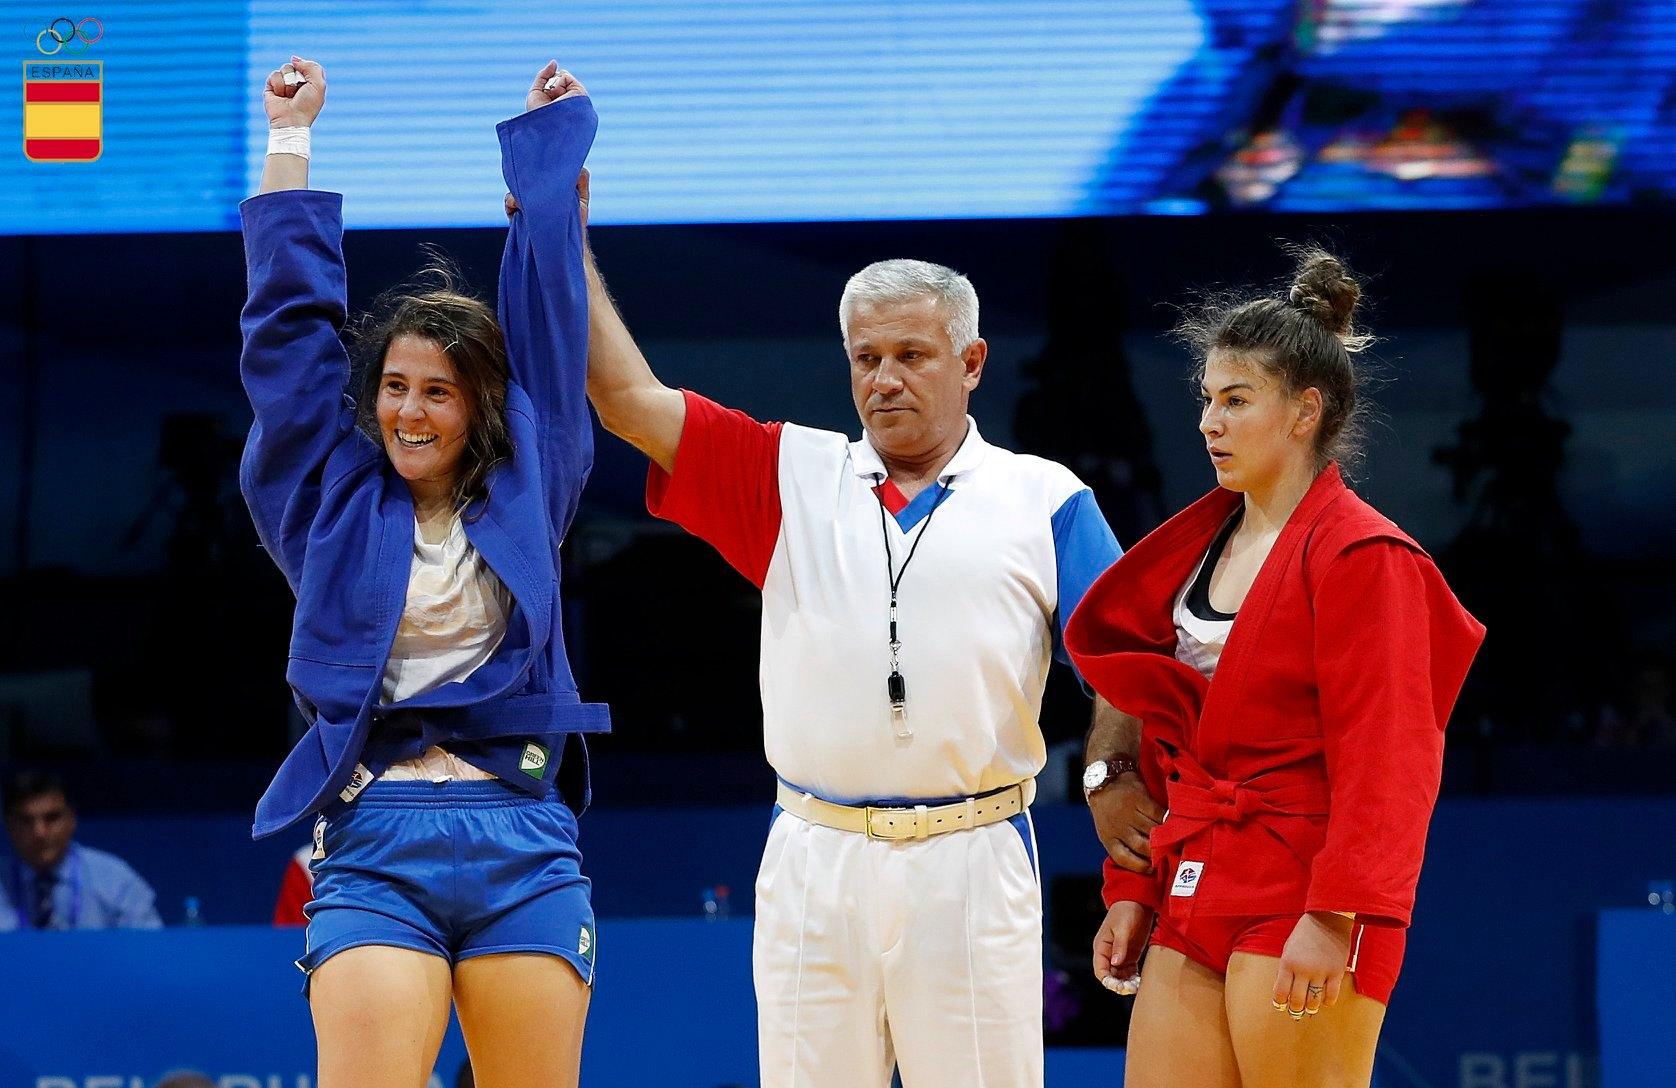 juegos olimpicos europeos yaiza jimnenez